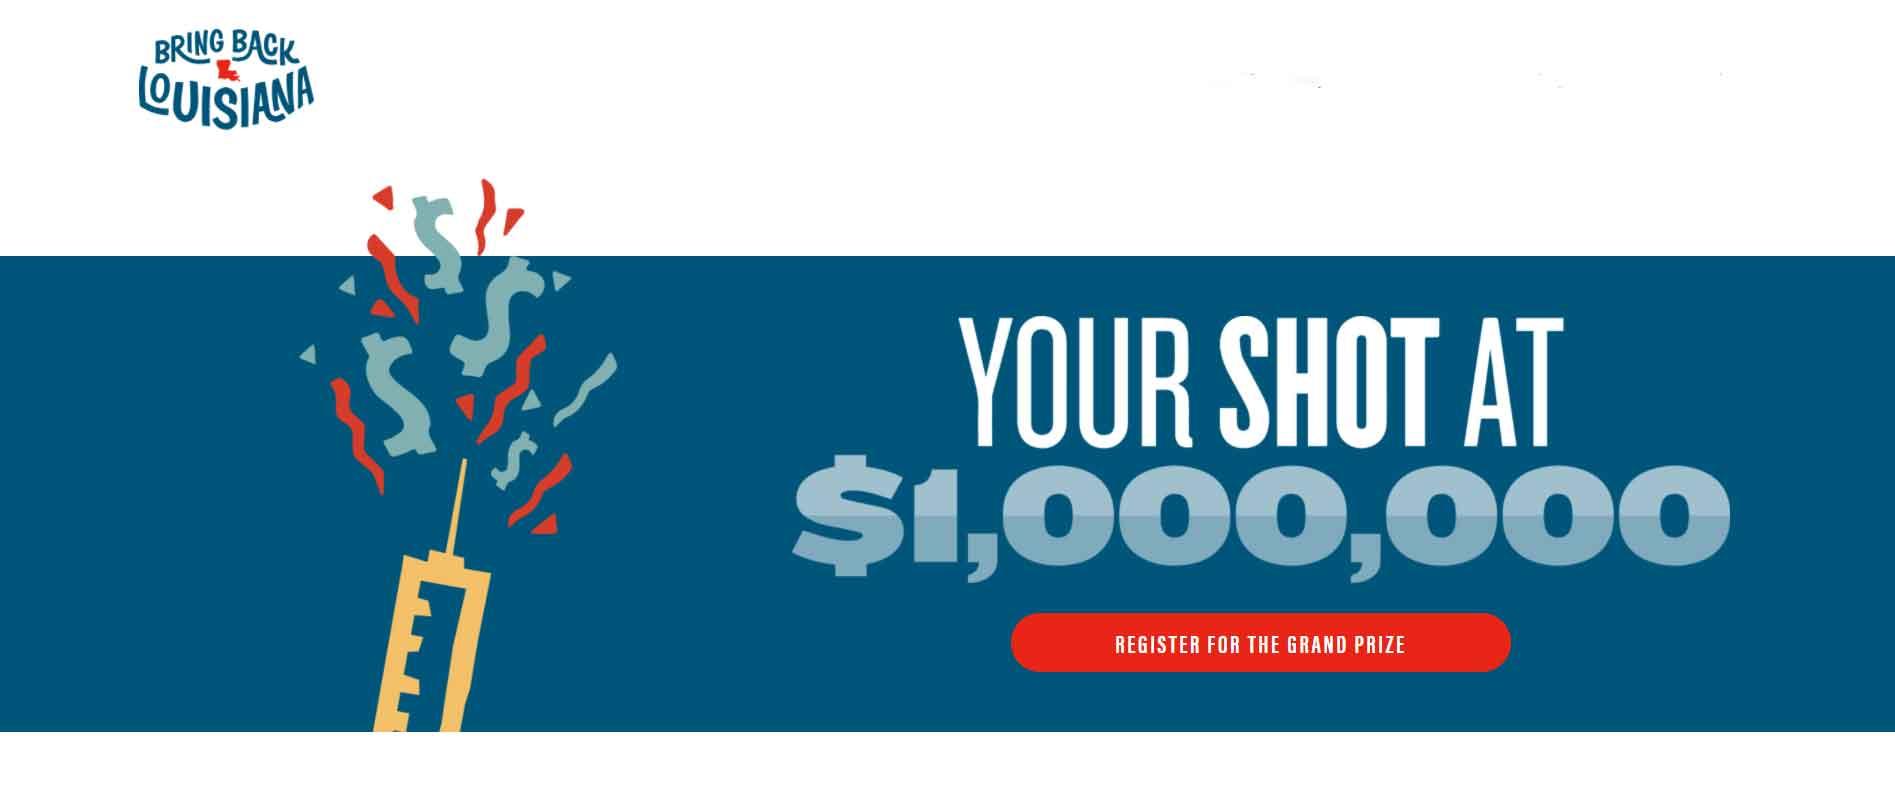 Louisiana Vaccine Lottery, Chance At $1,000,000